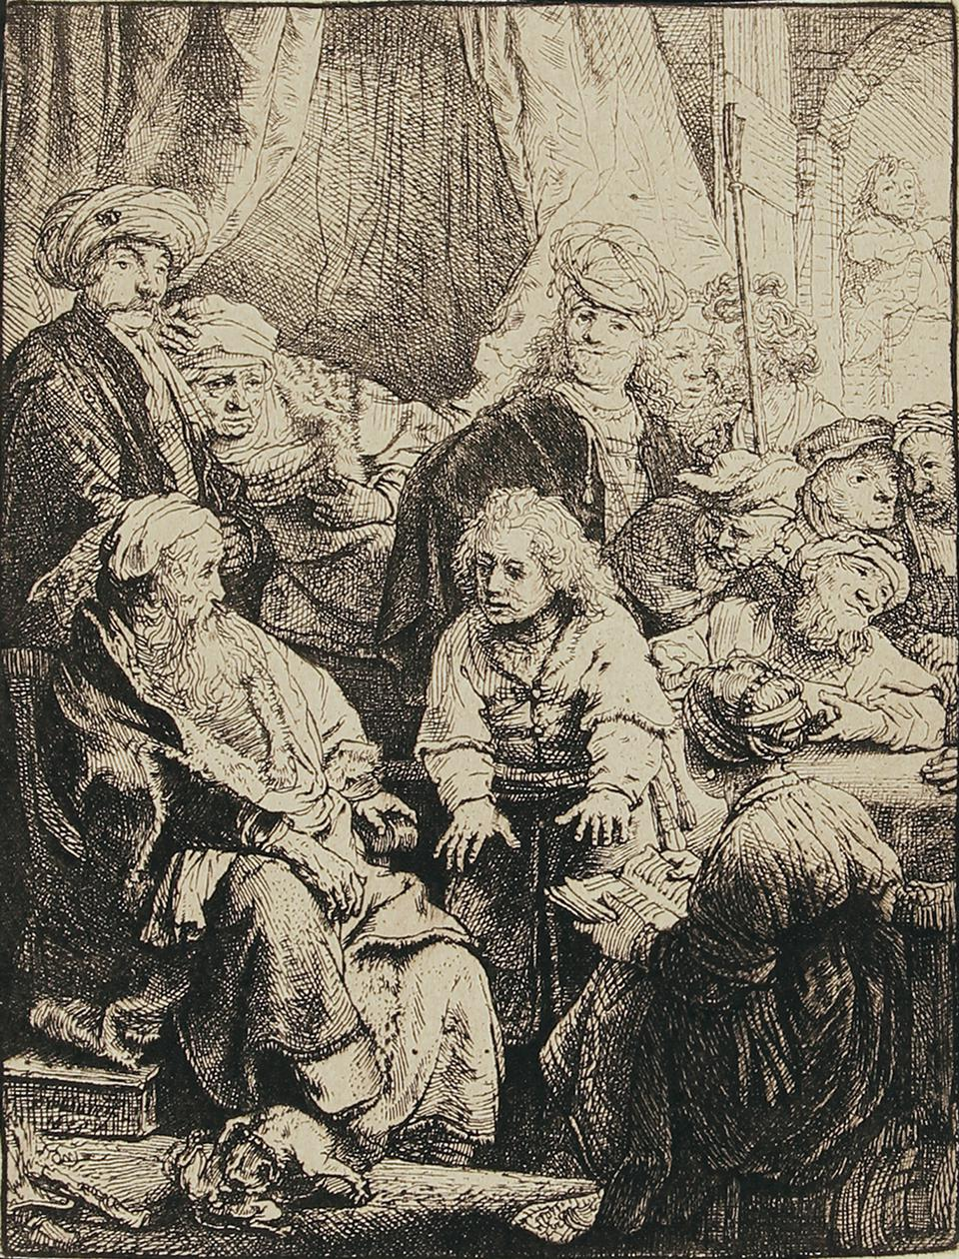 Rembrandt Harmenszoon van Rijn etchings on display at the Elverhoj Museum of History & Art, in Solvang, CA: 'Joseph Telling His Dreams.' Etching on laid paper, 1638.